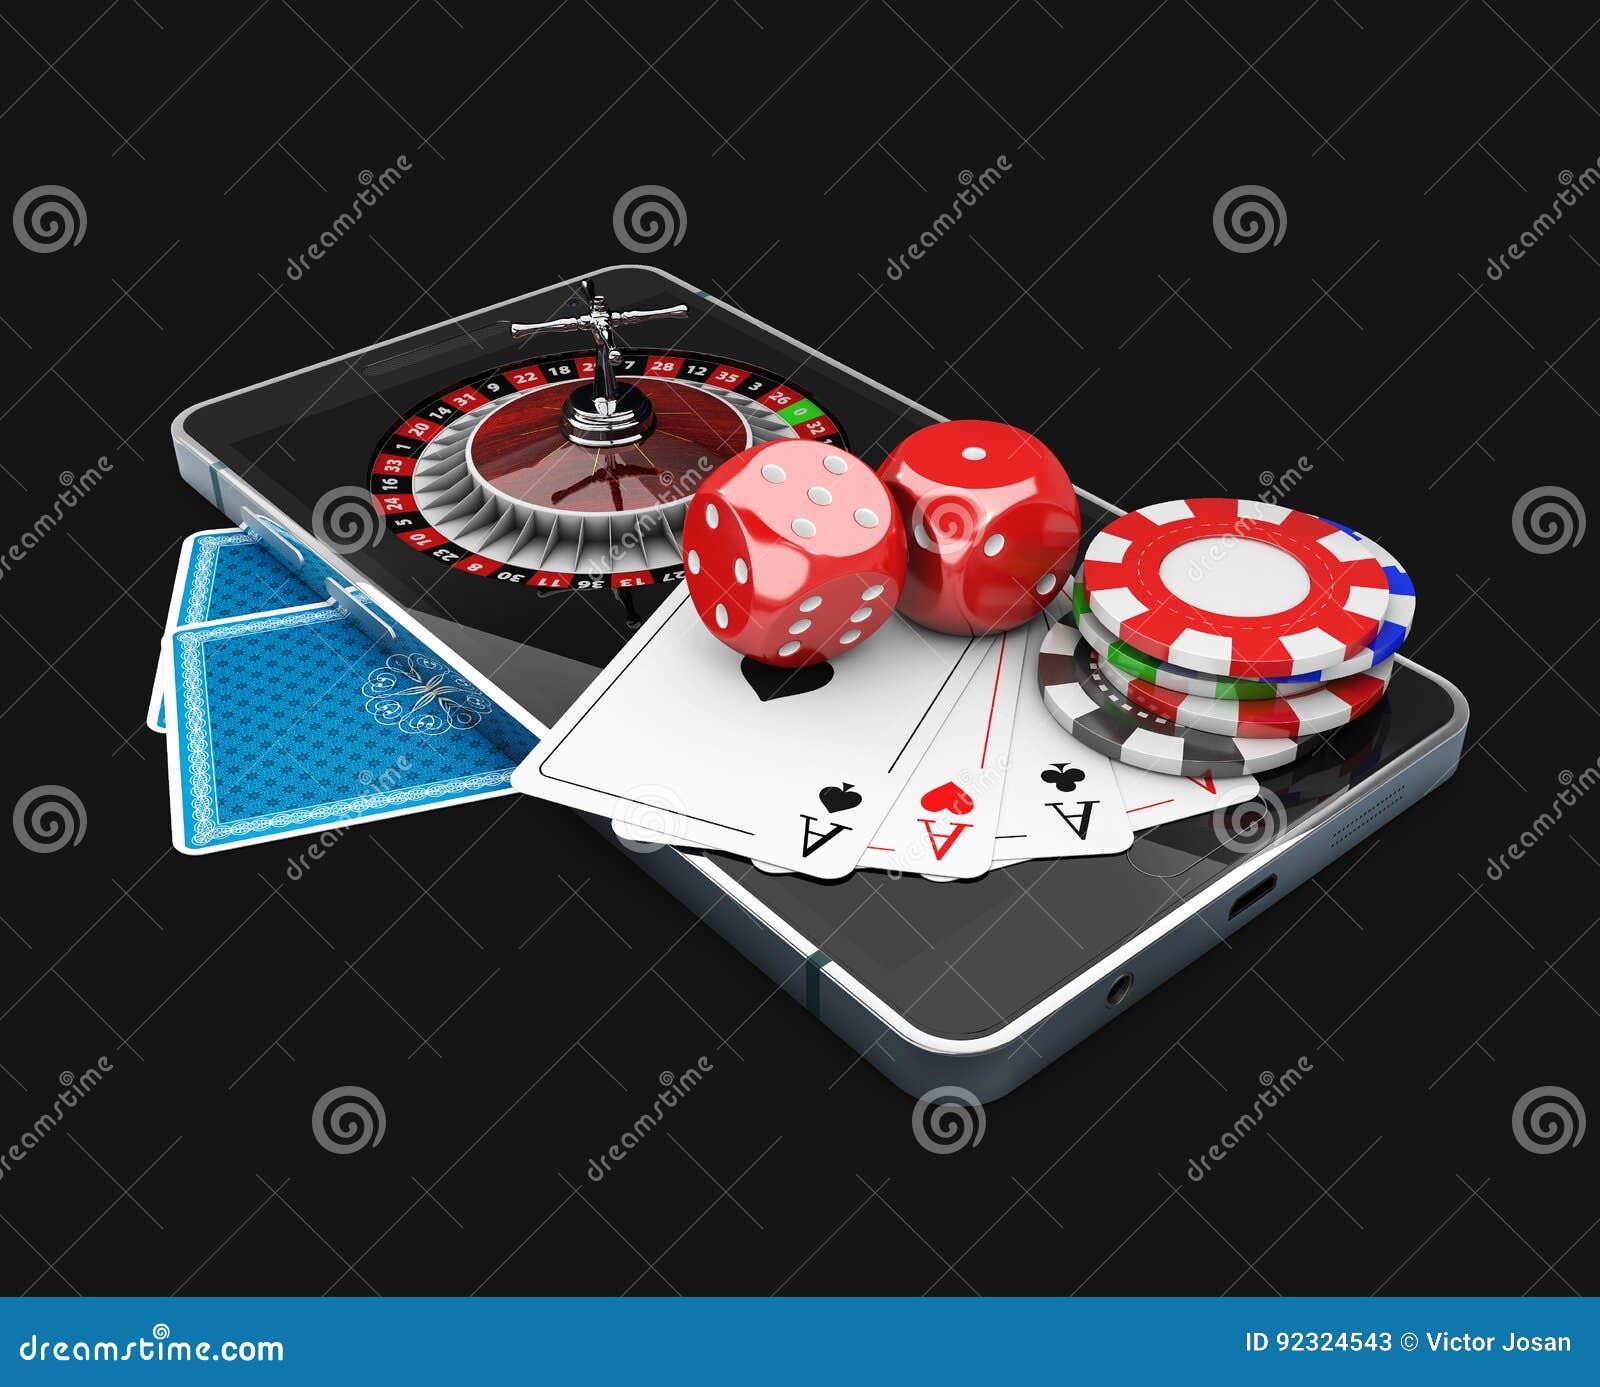 Chips online casino casino addict